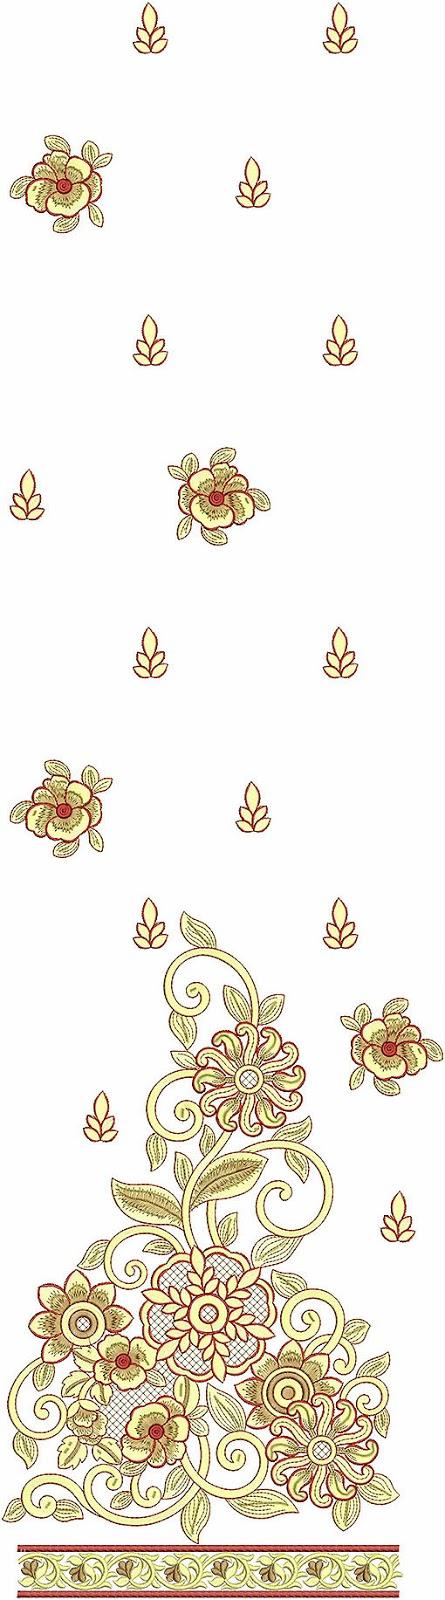 Embdesigntube blasting embroidery kurti collection of